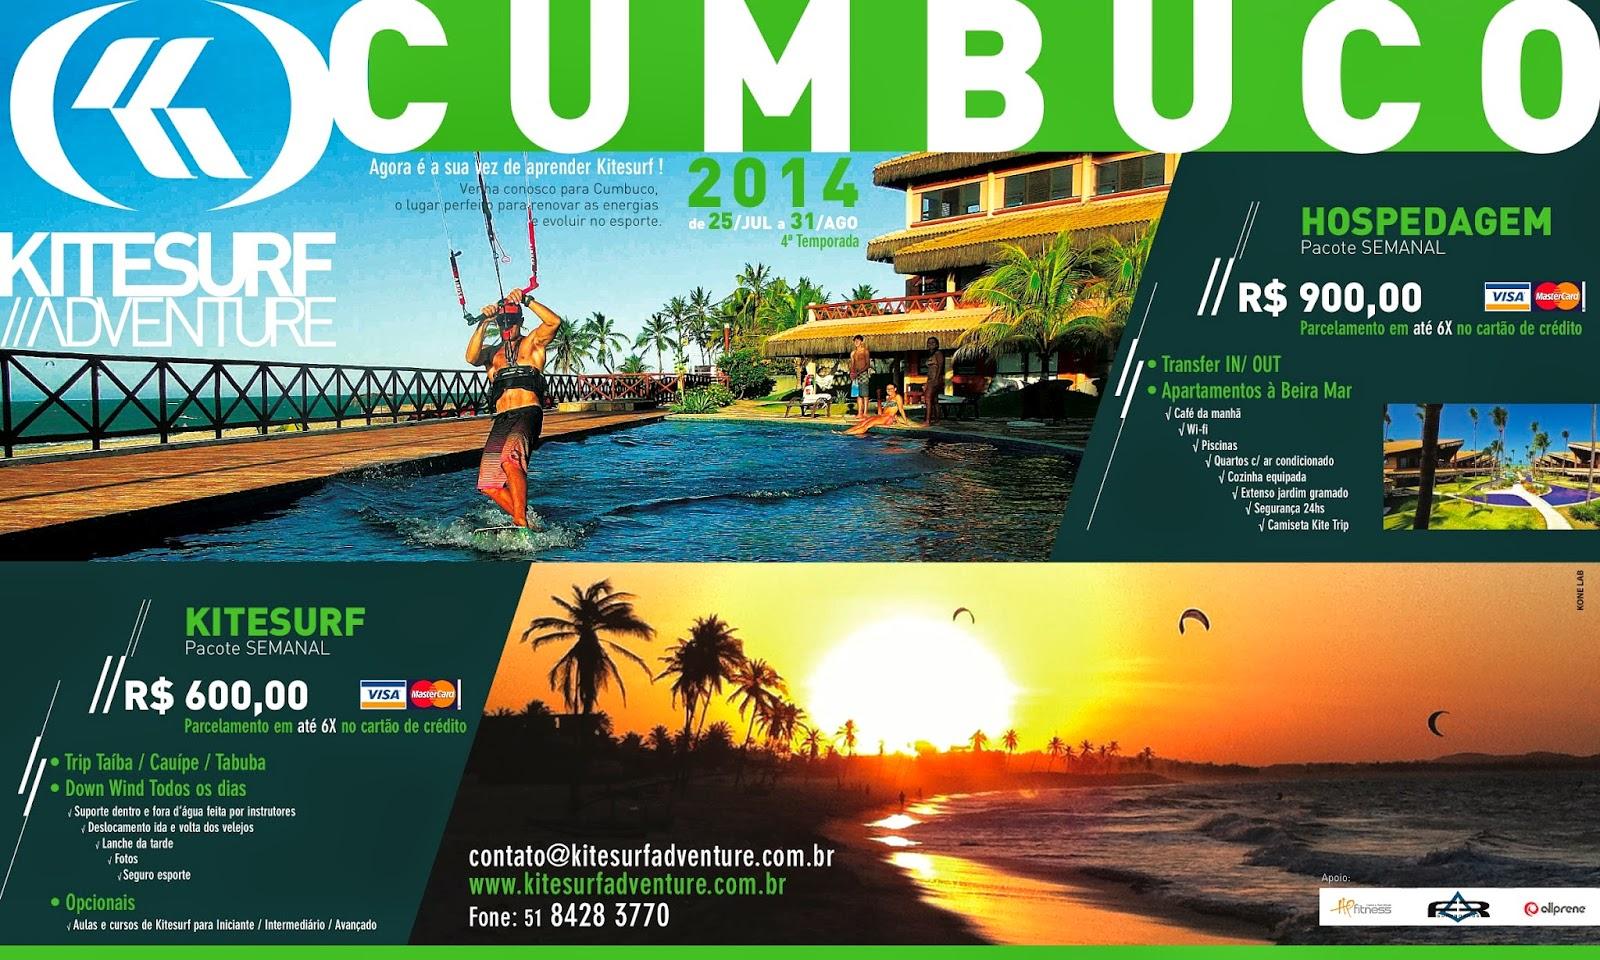 kitesurf adventure cumbuco 2014 ceara kitetrip brazil kiteboarding